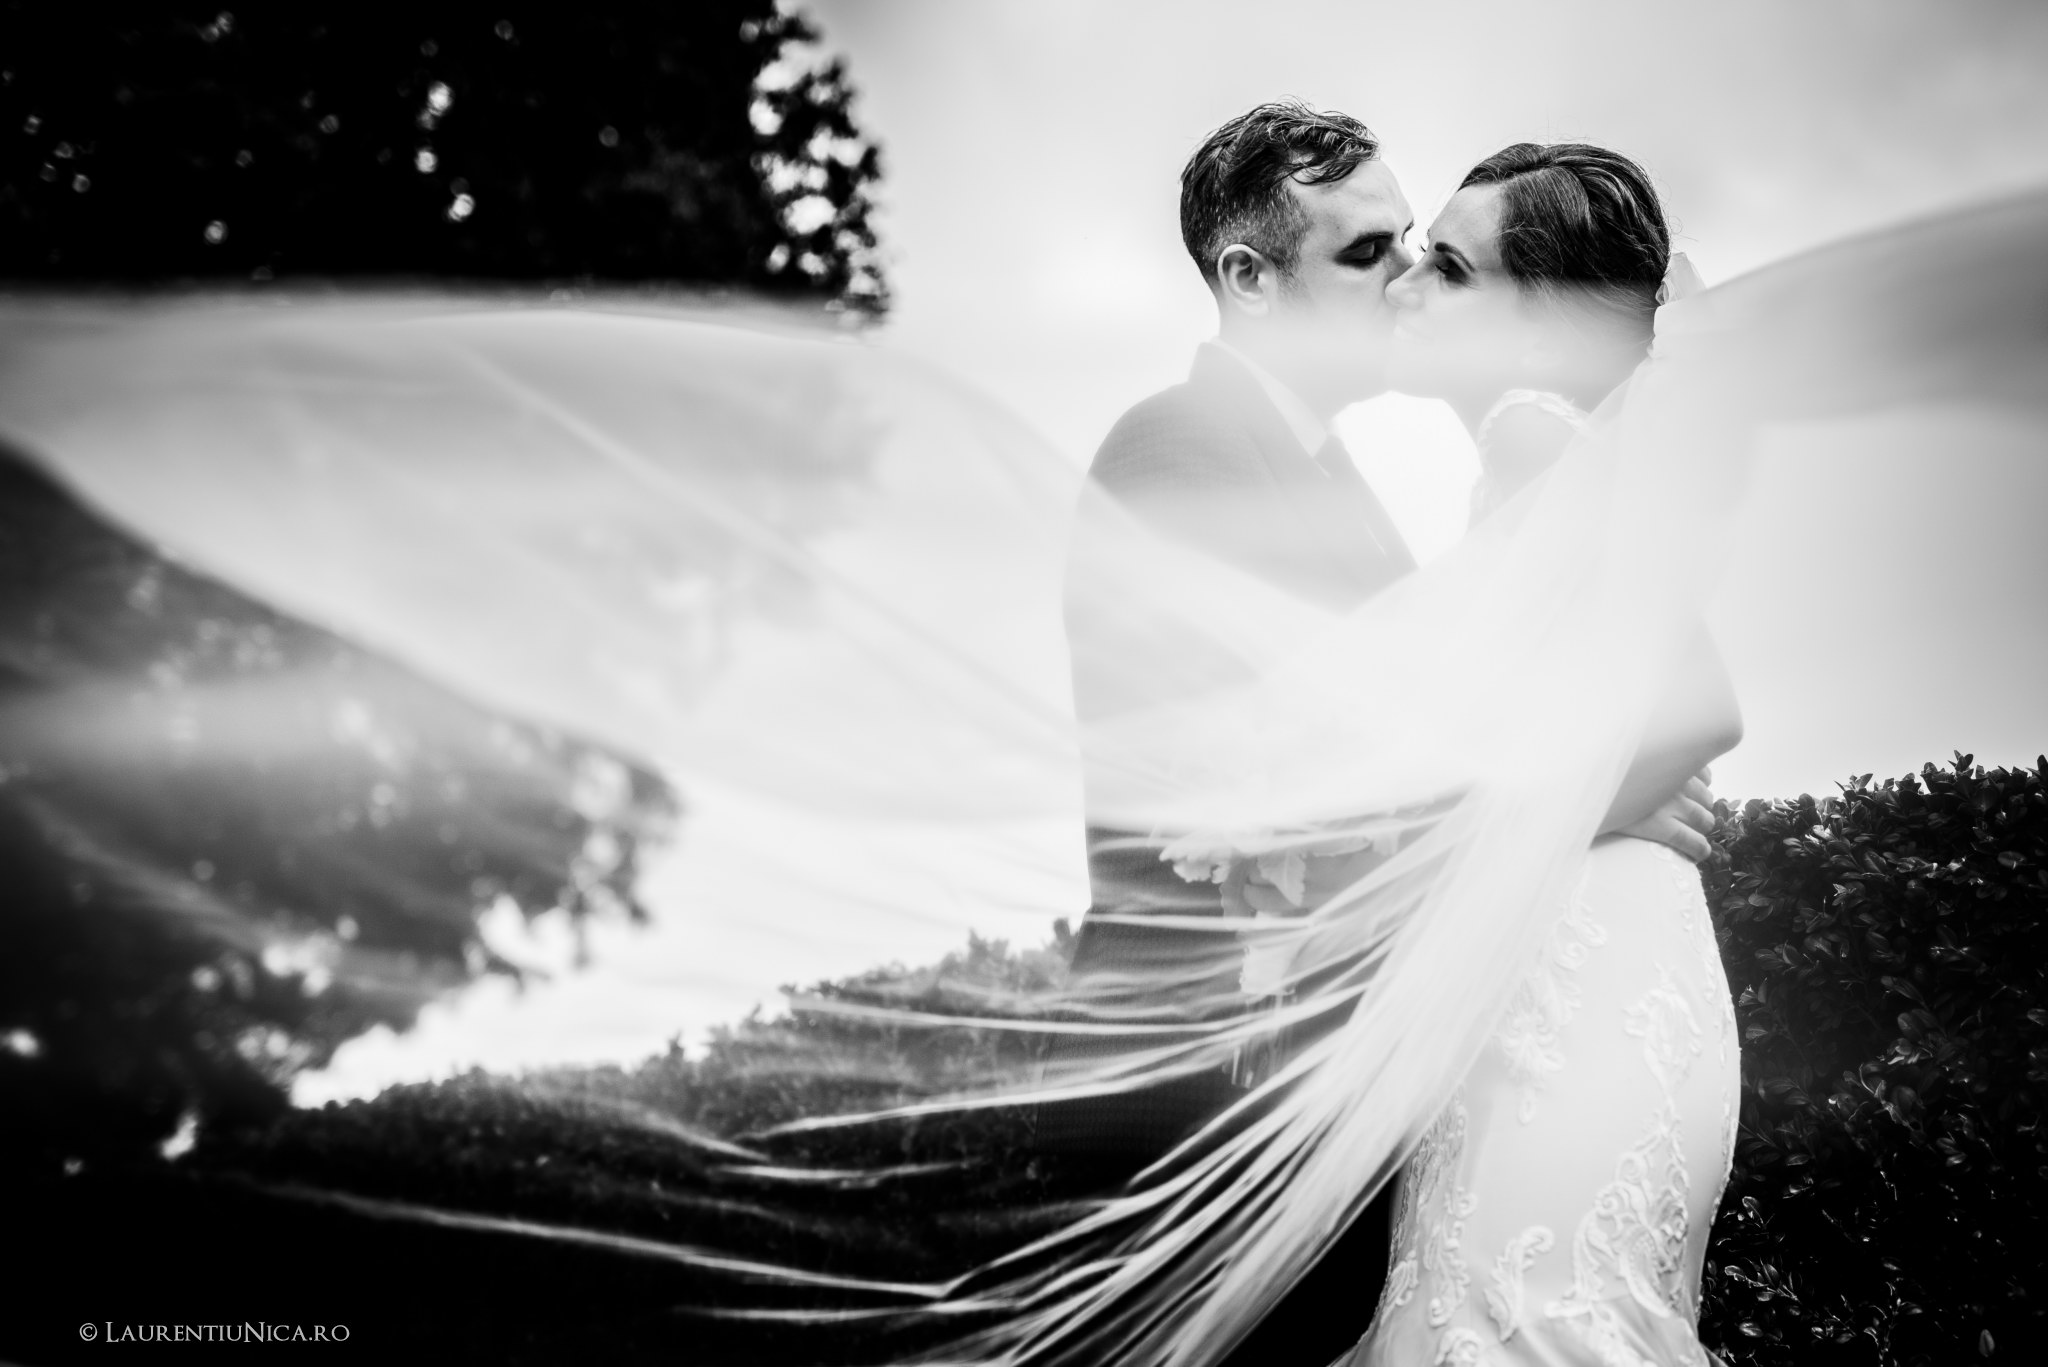 andreea si alin fotografii after wedding balchik bulgaria20 - Andreea & Alin | Fotografii After Wedding | Balchik Bulgaria